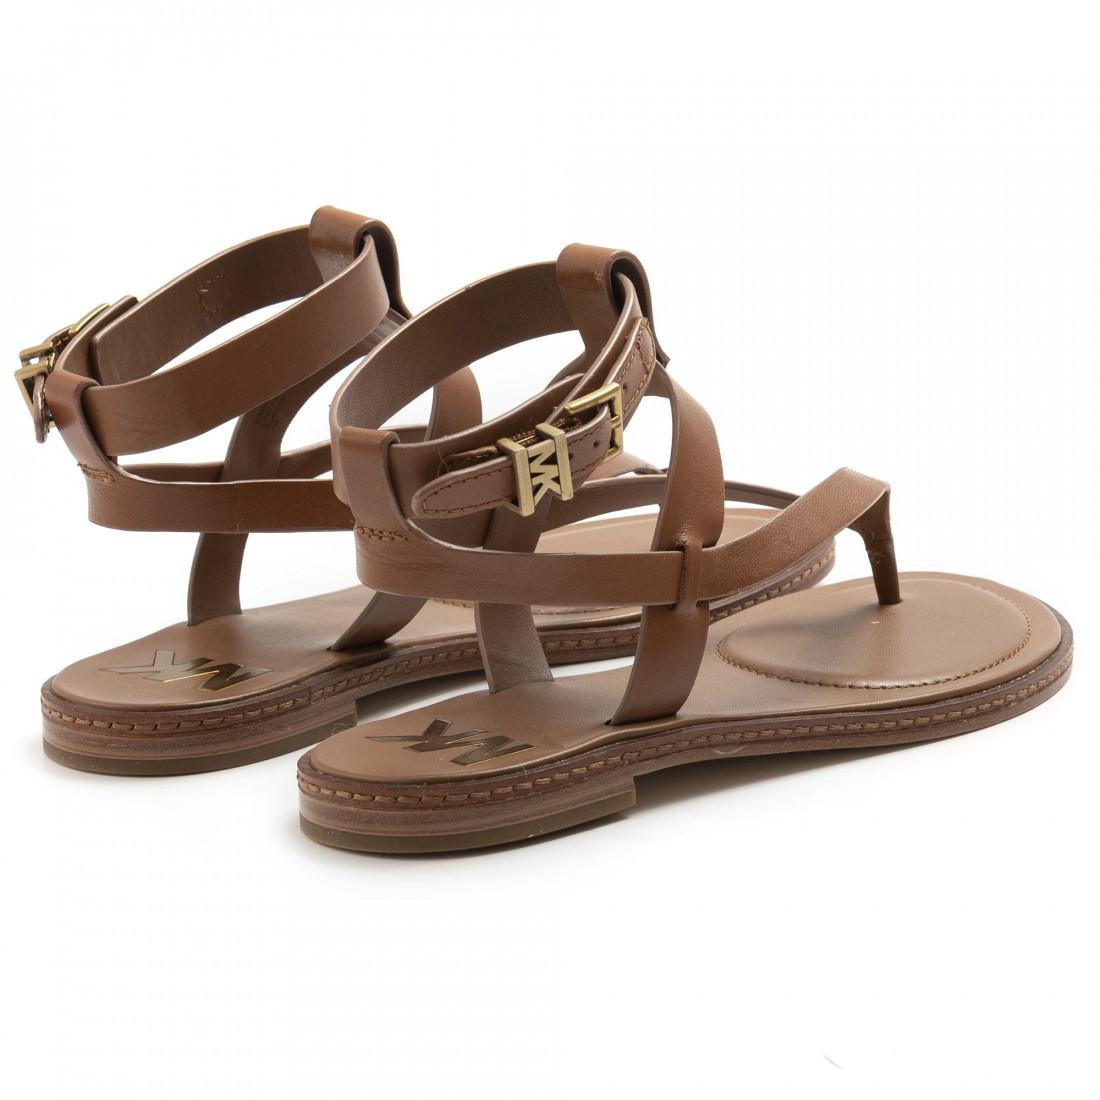 sandals woman michael kors 40s0pefa1l230 6869